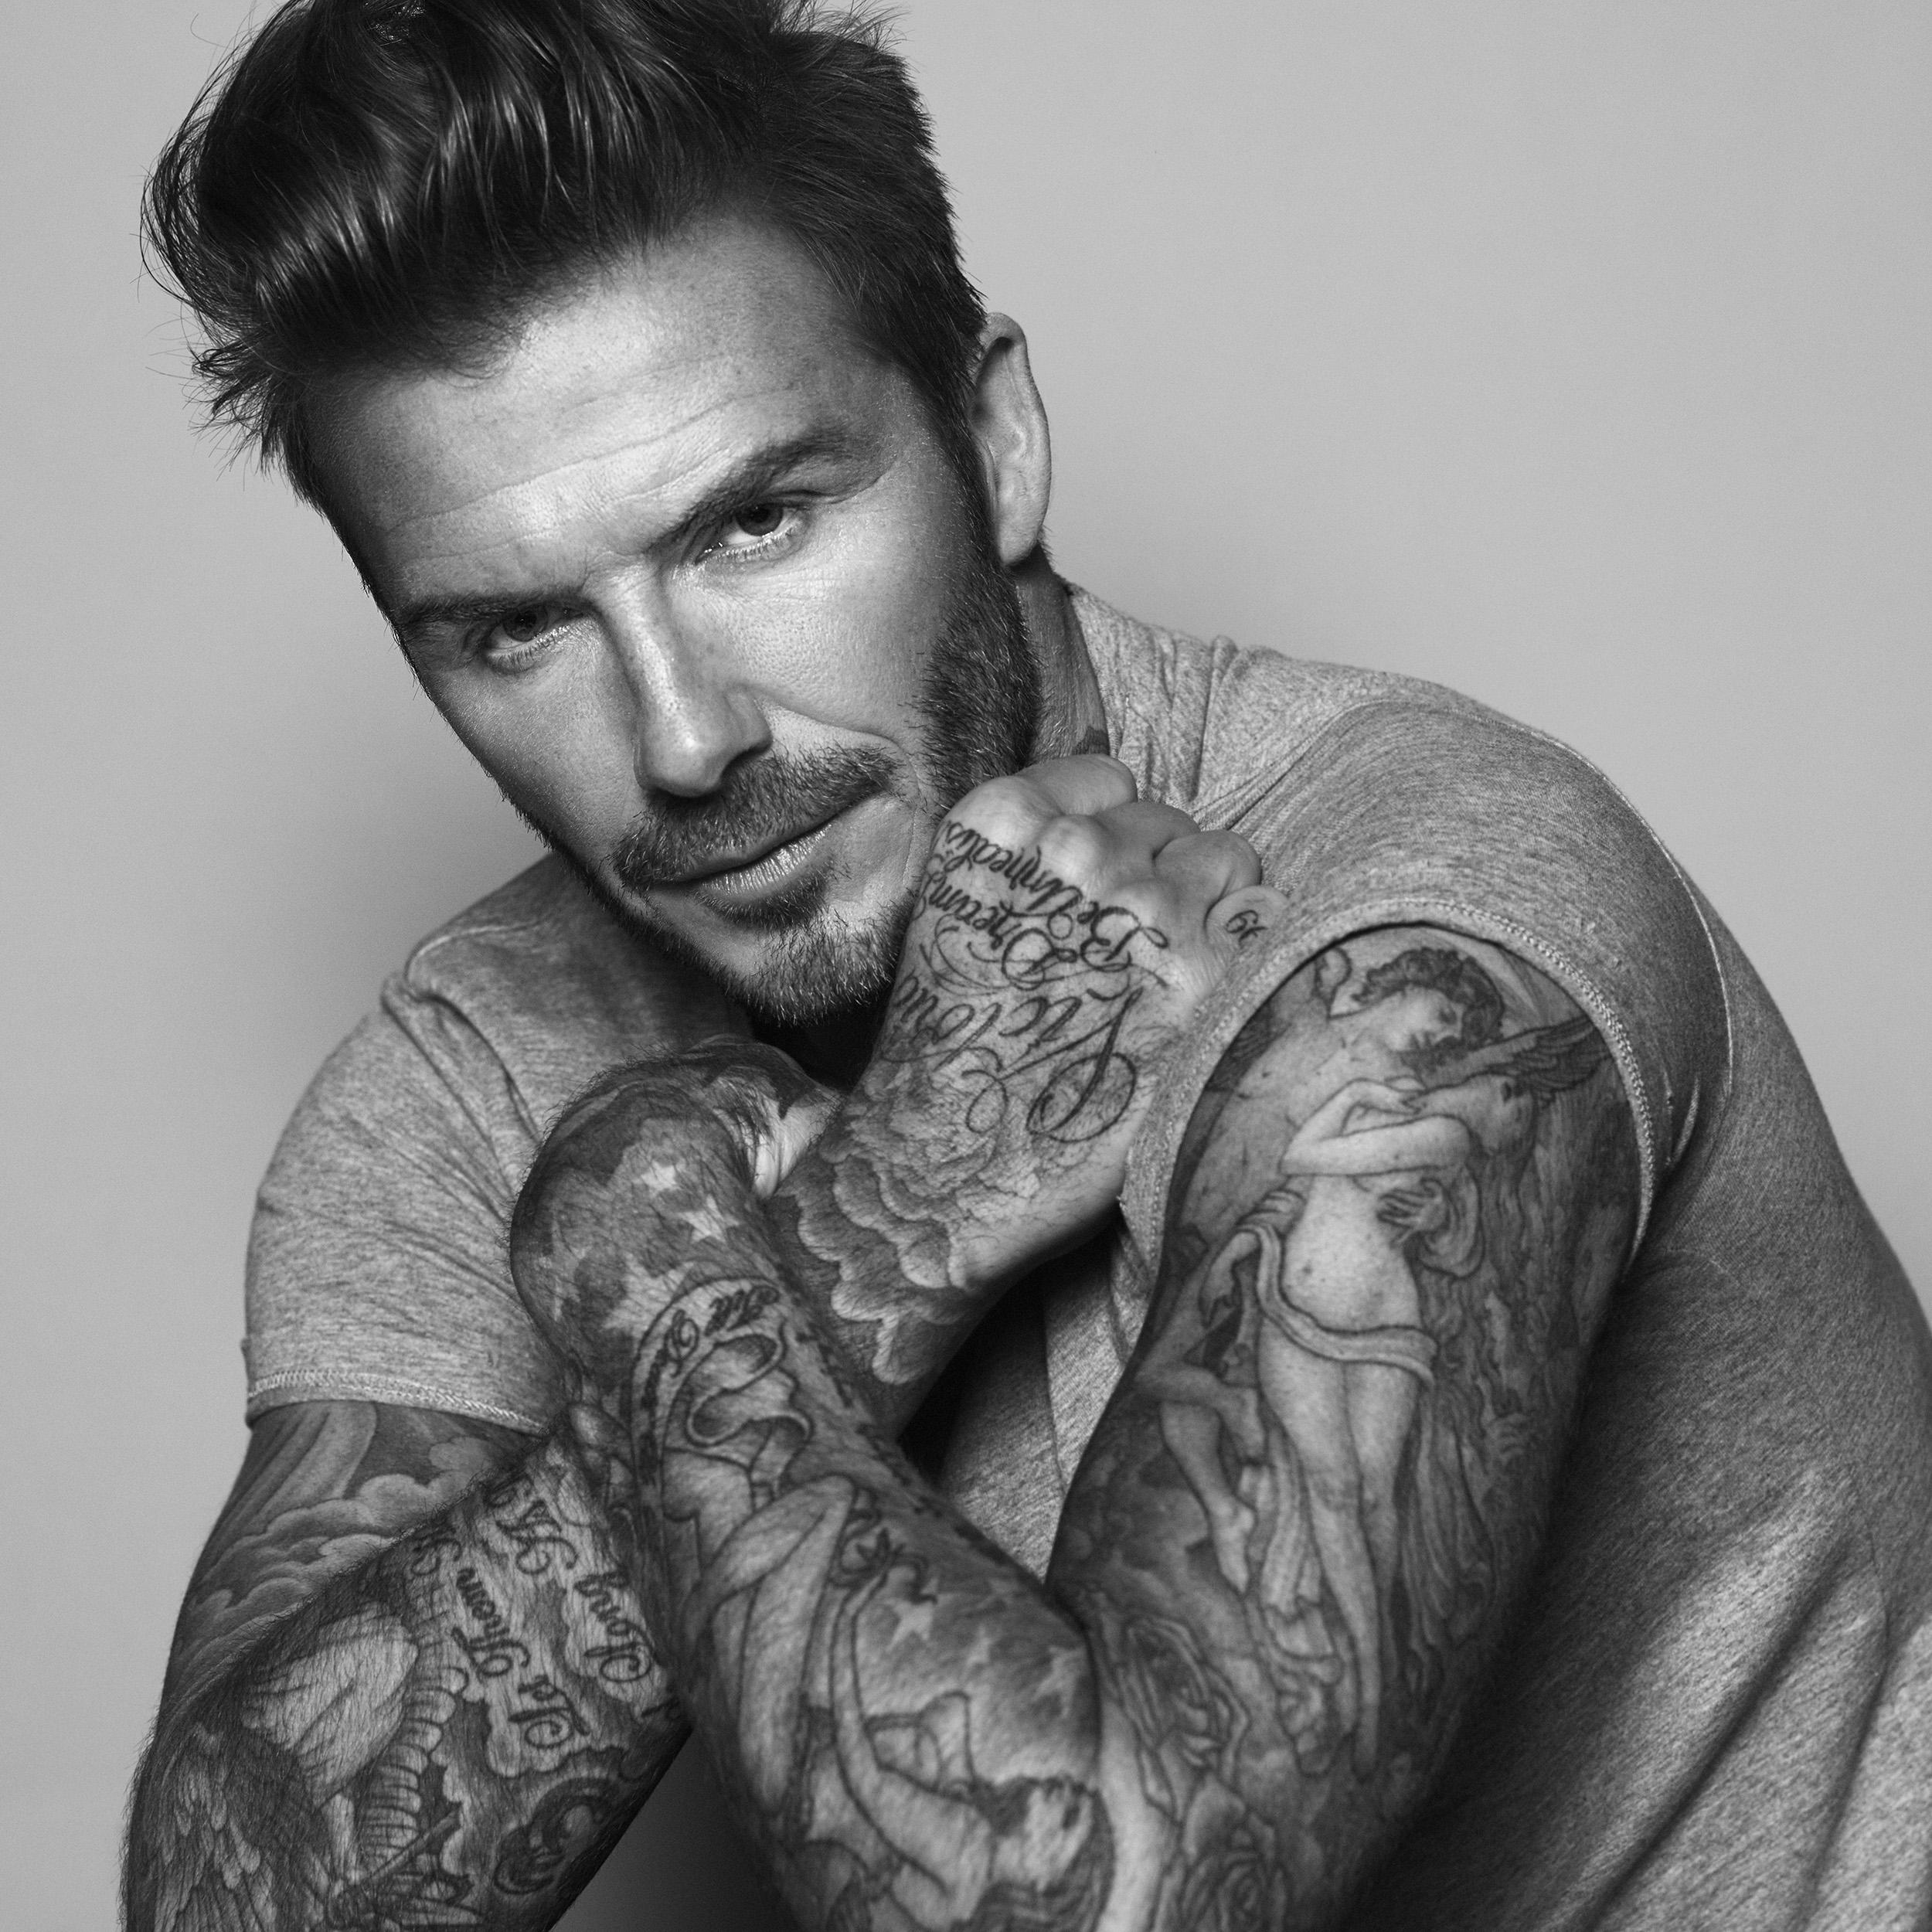 Biotherm Homme And David Beckham Sign LongTerm Partnership To - Hair product david beckham uses